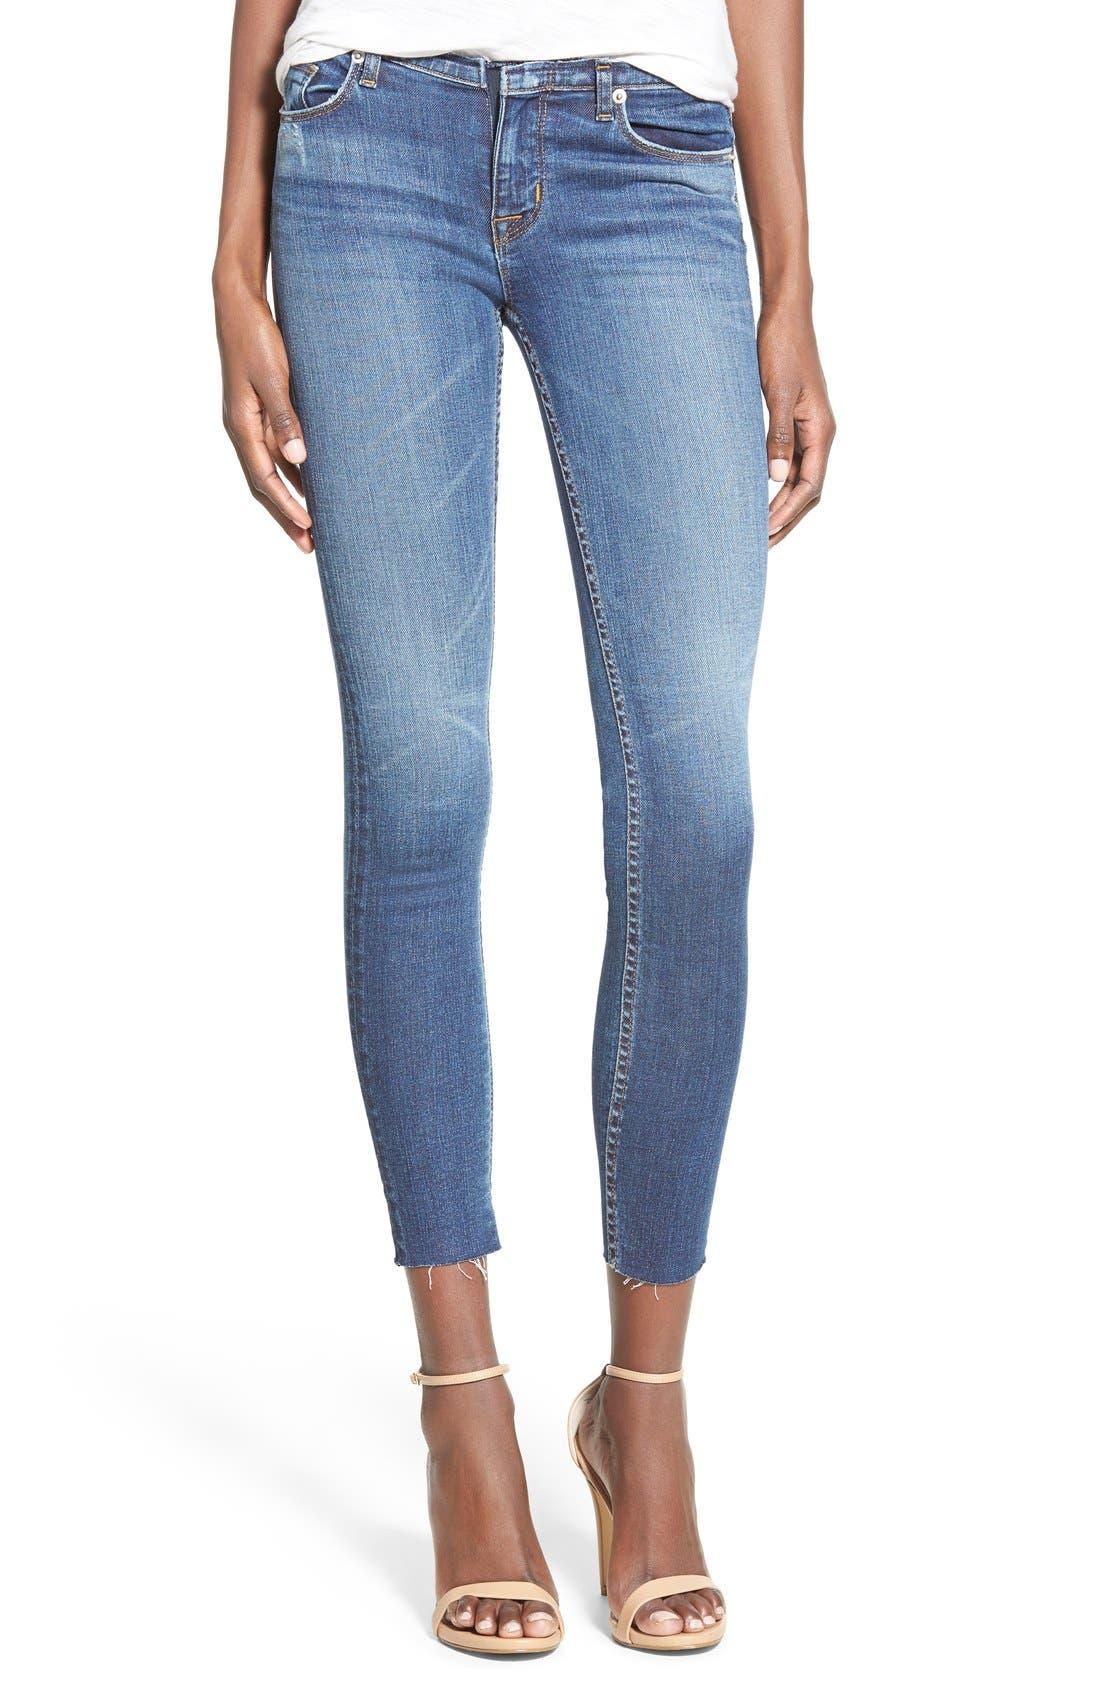 Alternate Image 1 Selected - Hudson Jeans 'Krista' Raw Hem Ankle Super Skinny Jeans (Point Break)